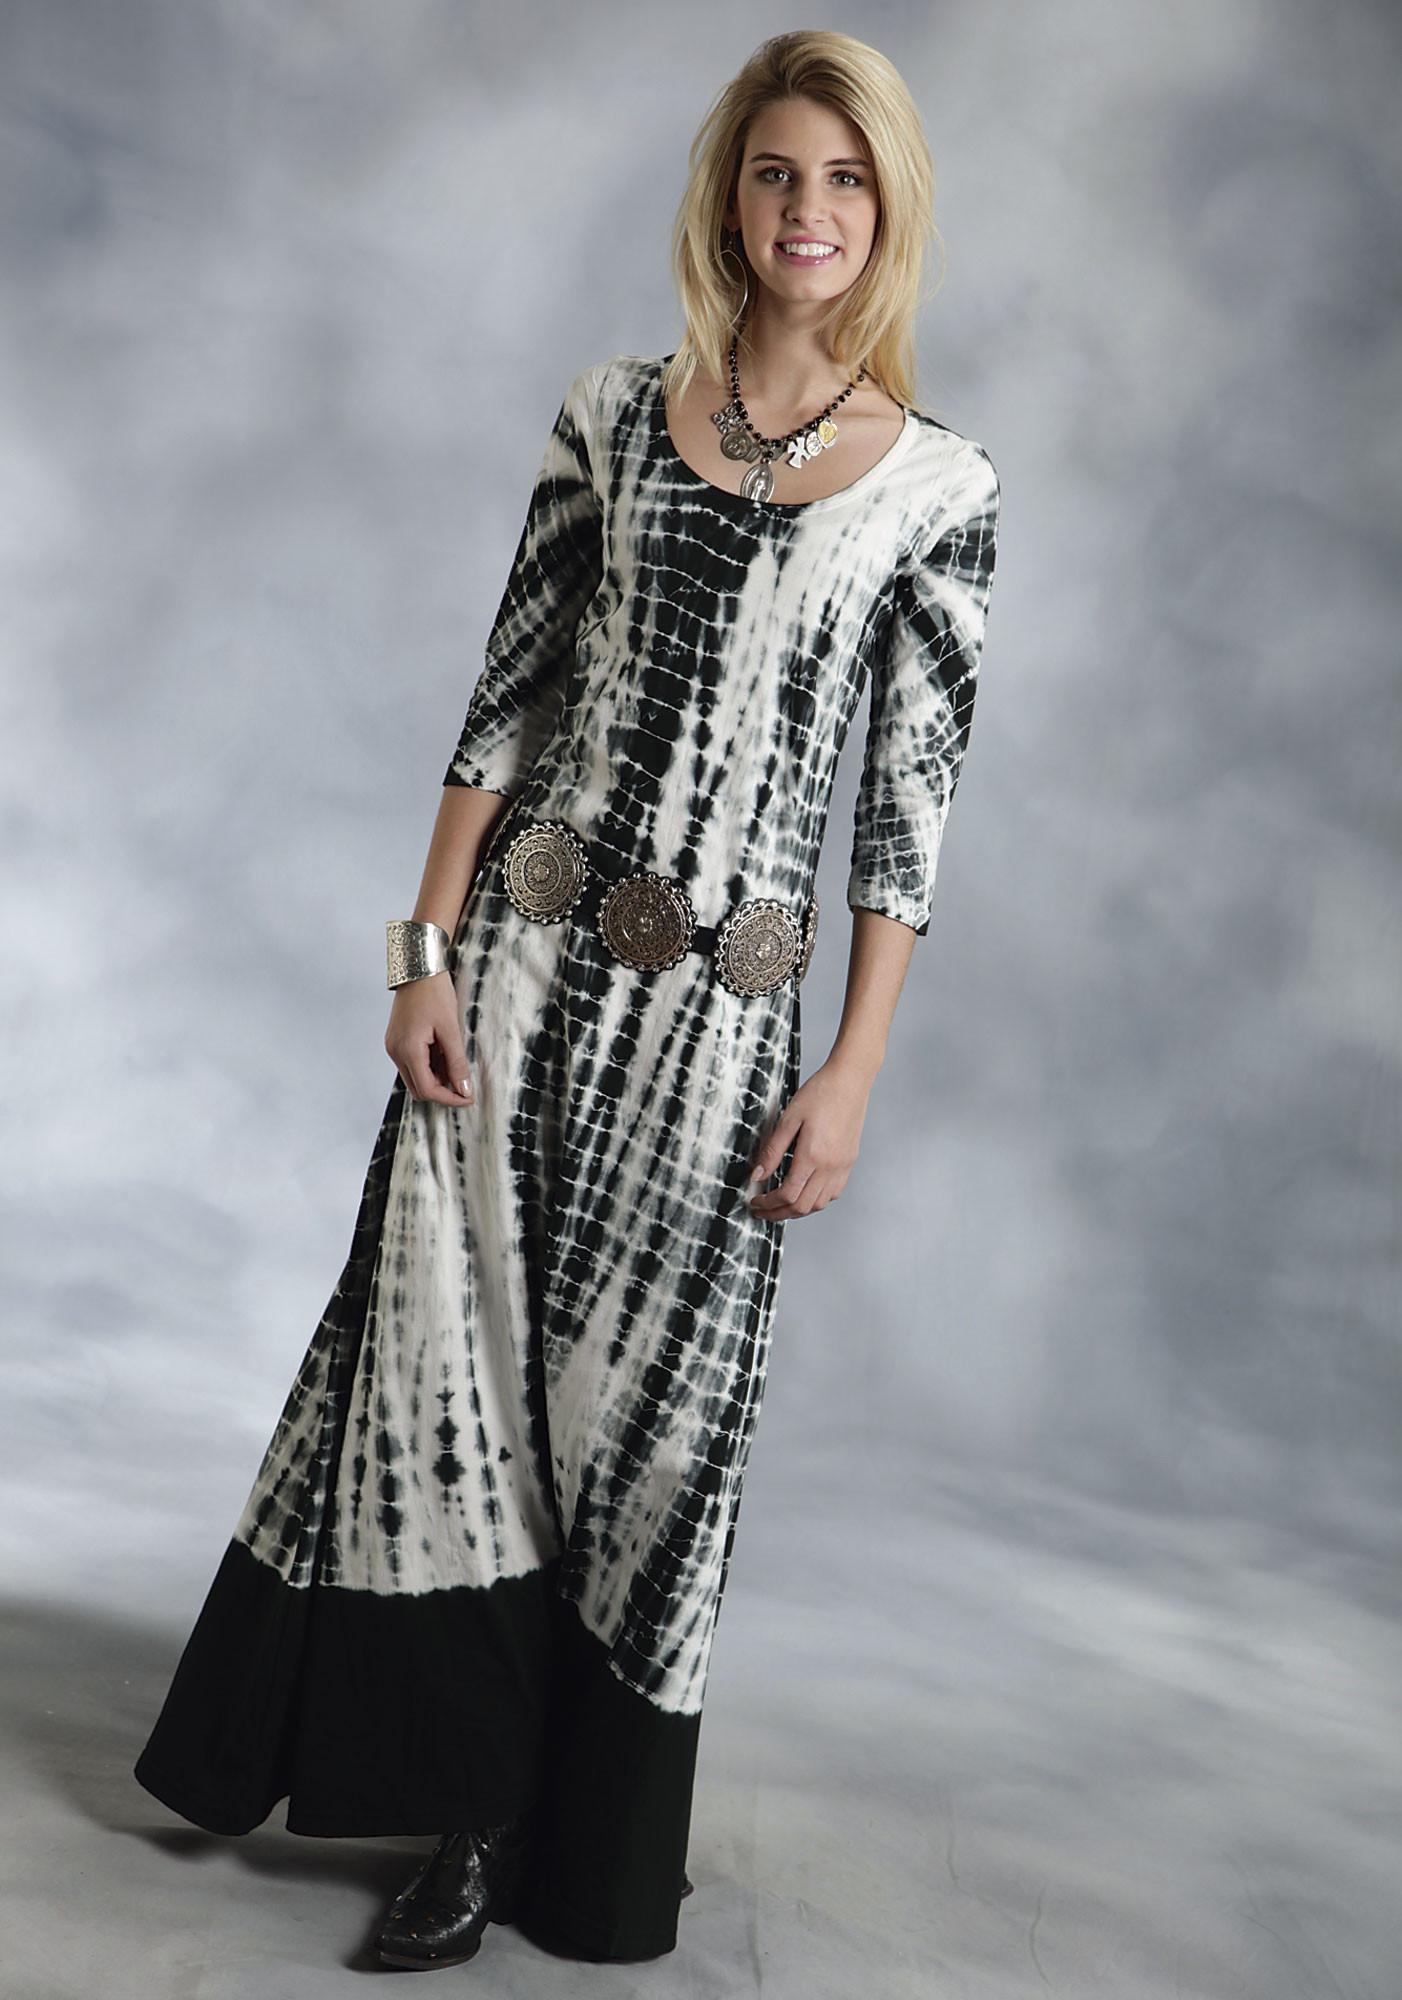 Black and white tie-dye dresses